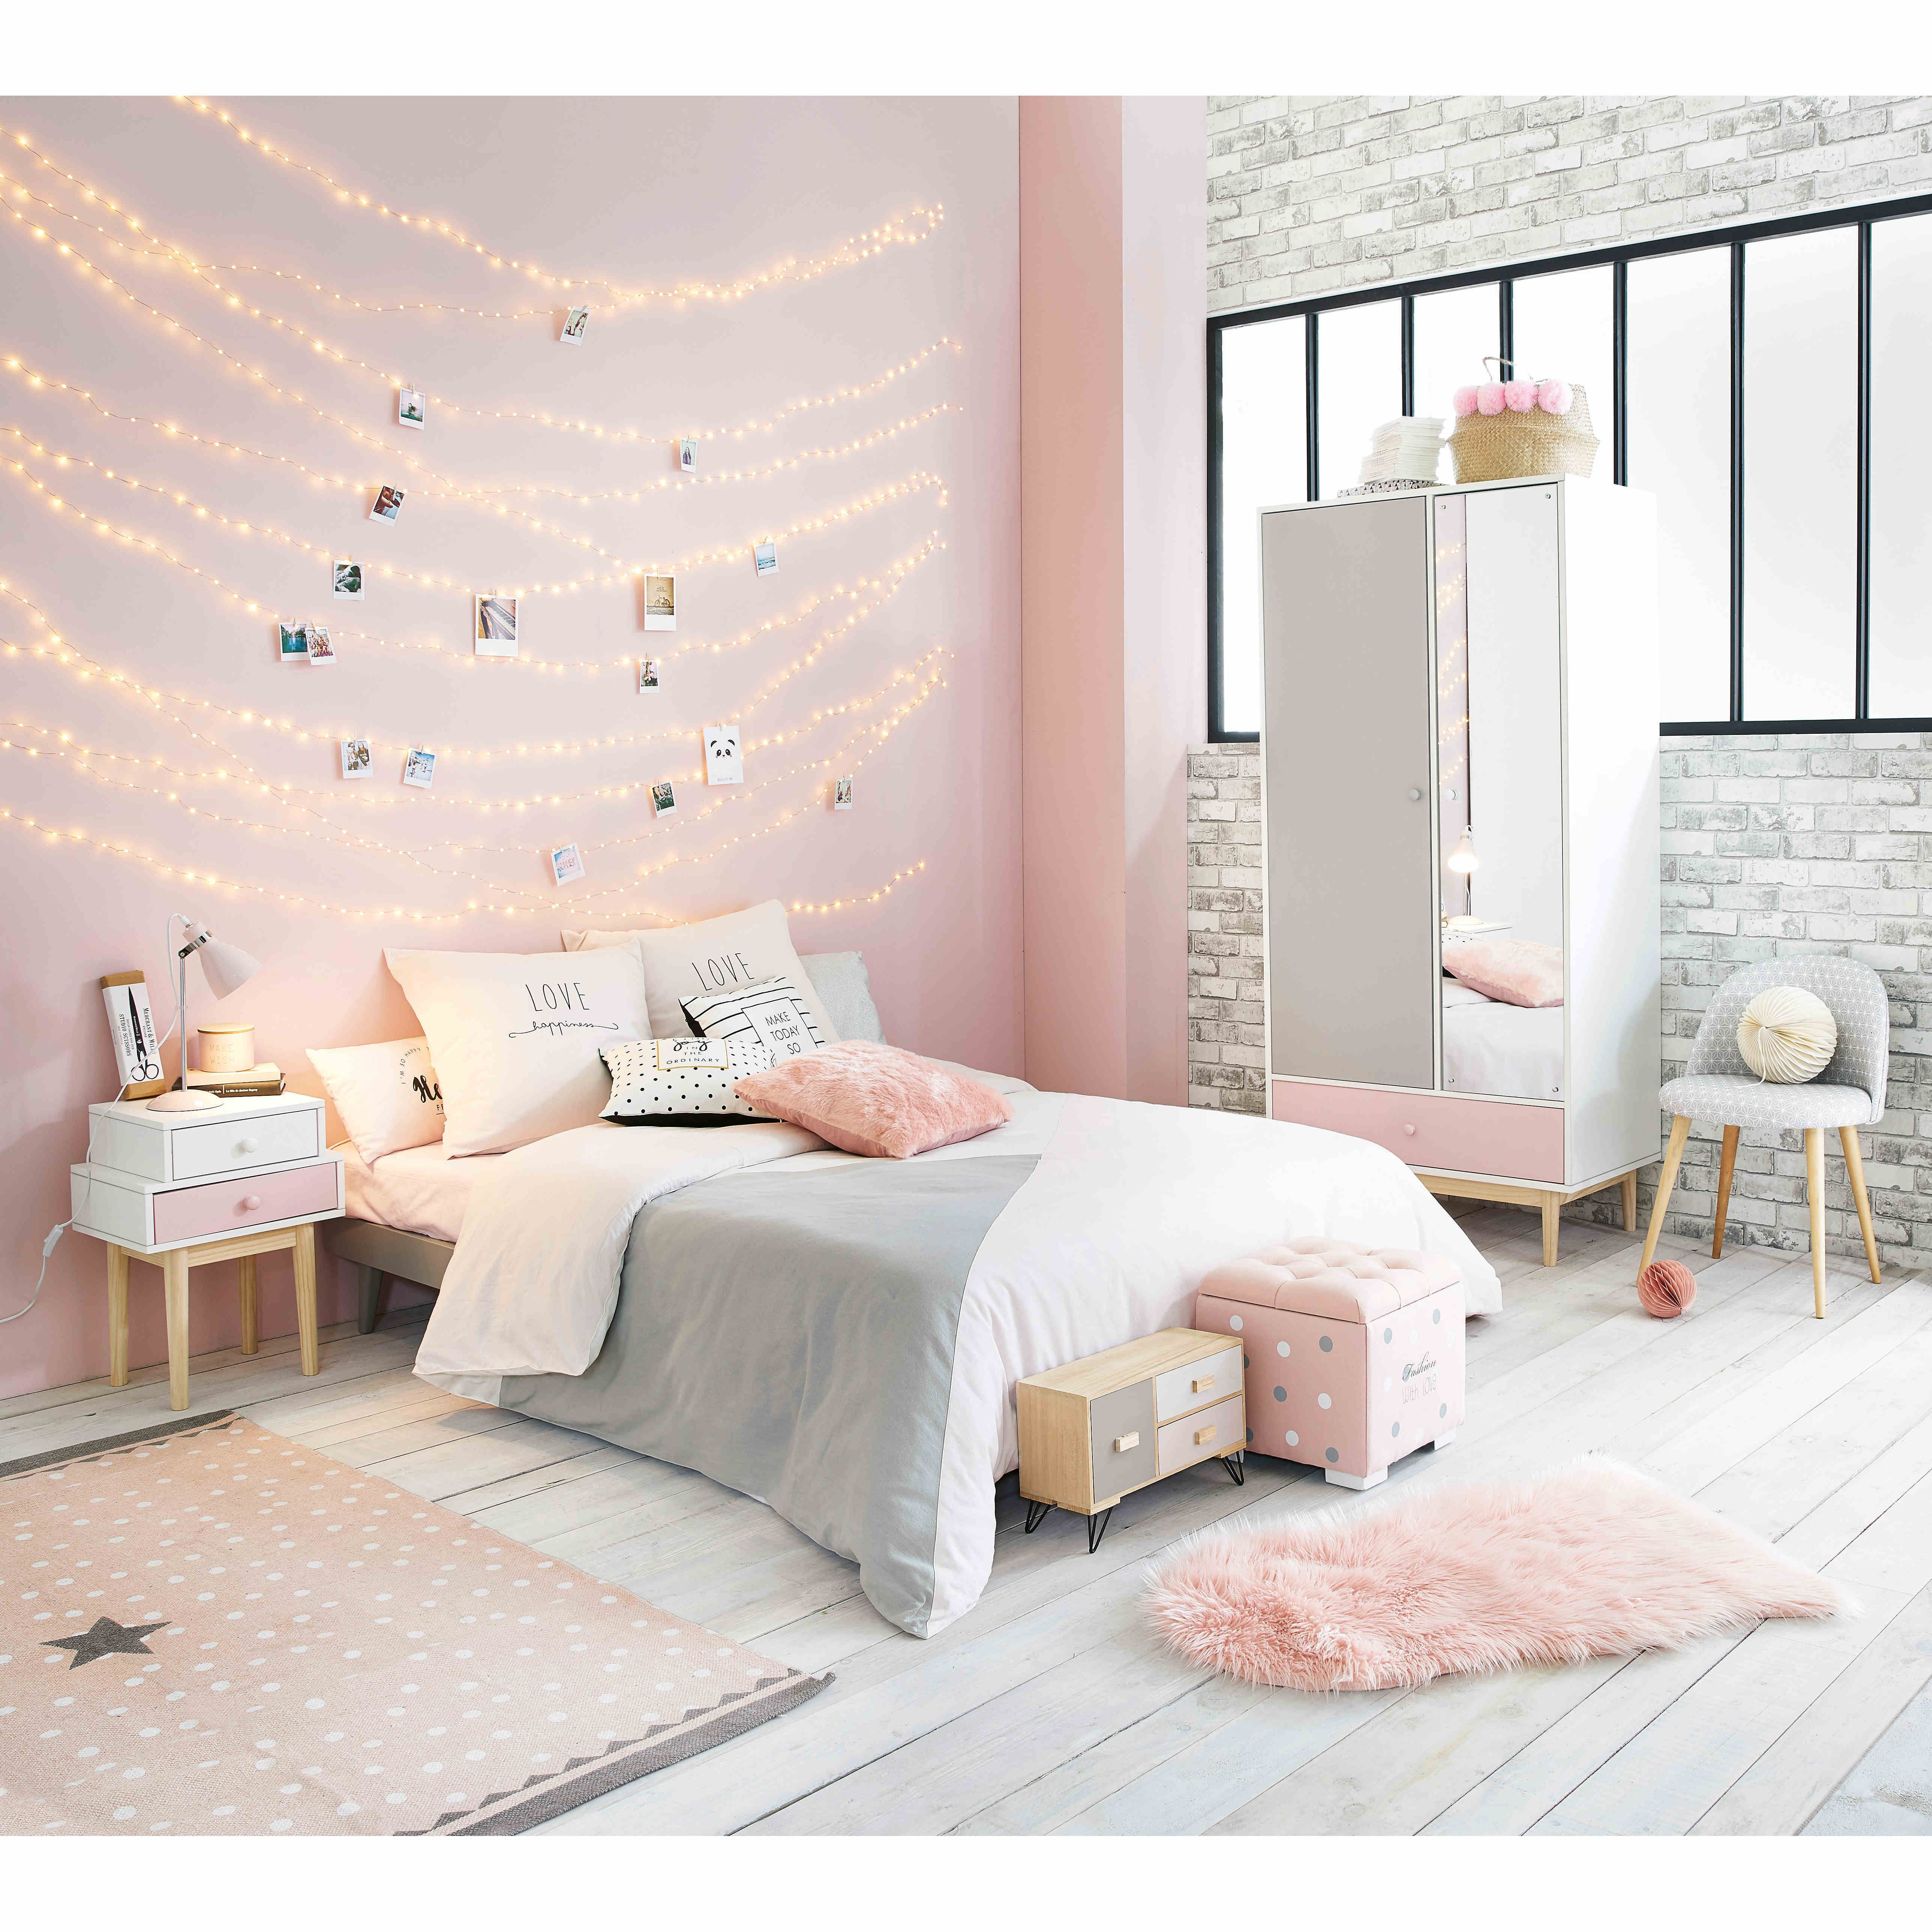 tapis mouton imitation fourrure rose 90x60 chambres. Black Bedroom Furniture Sets. Home Design Ideas